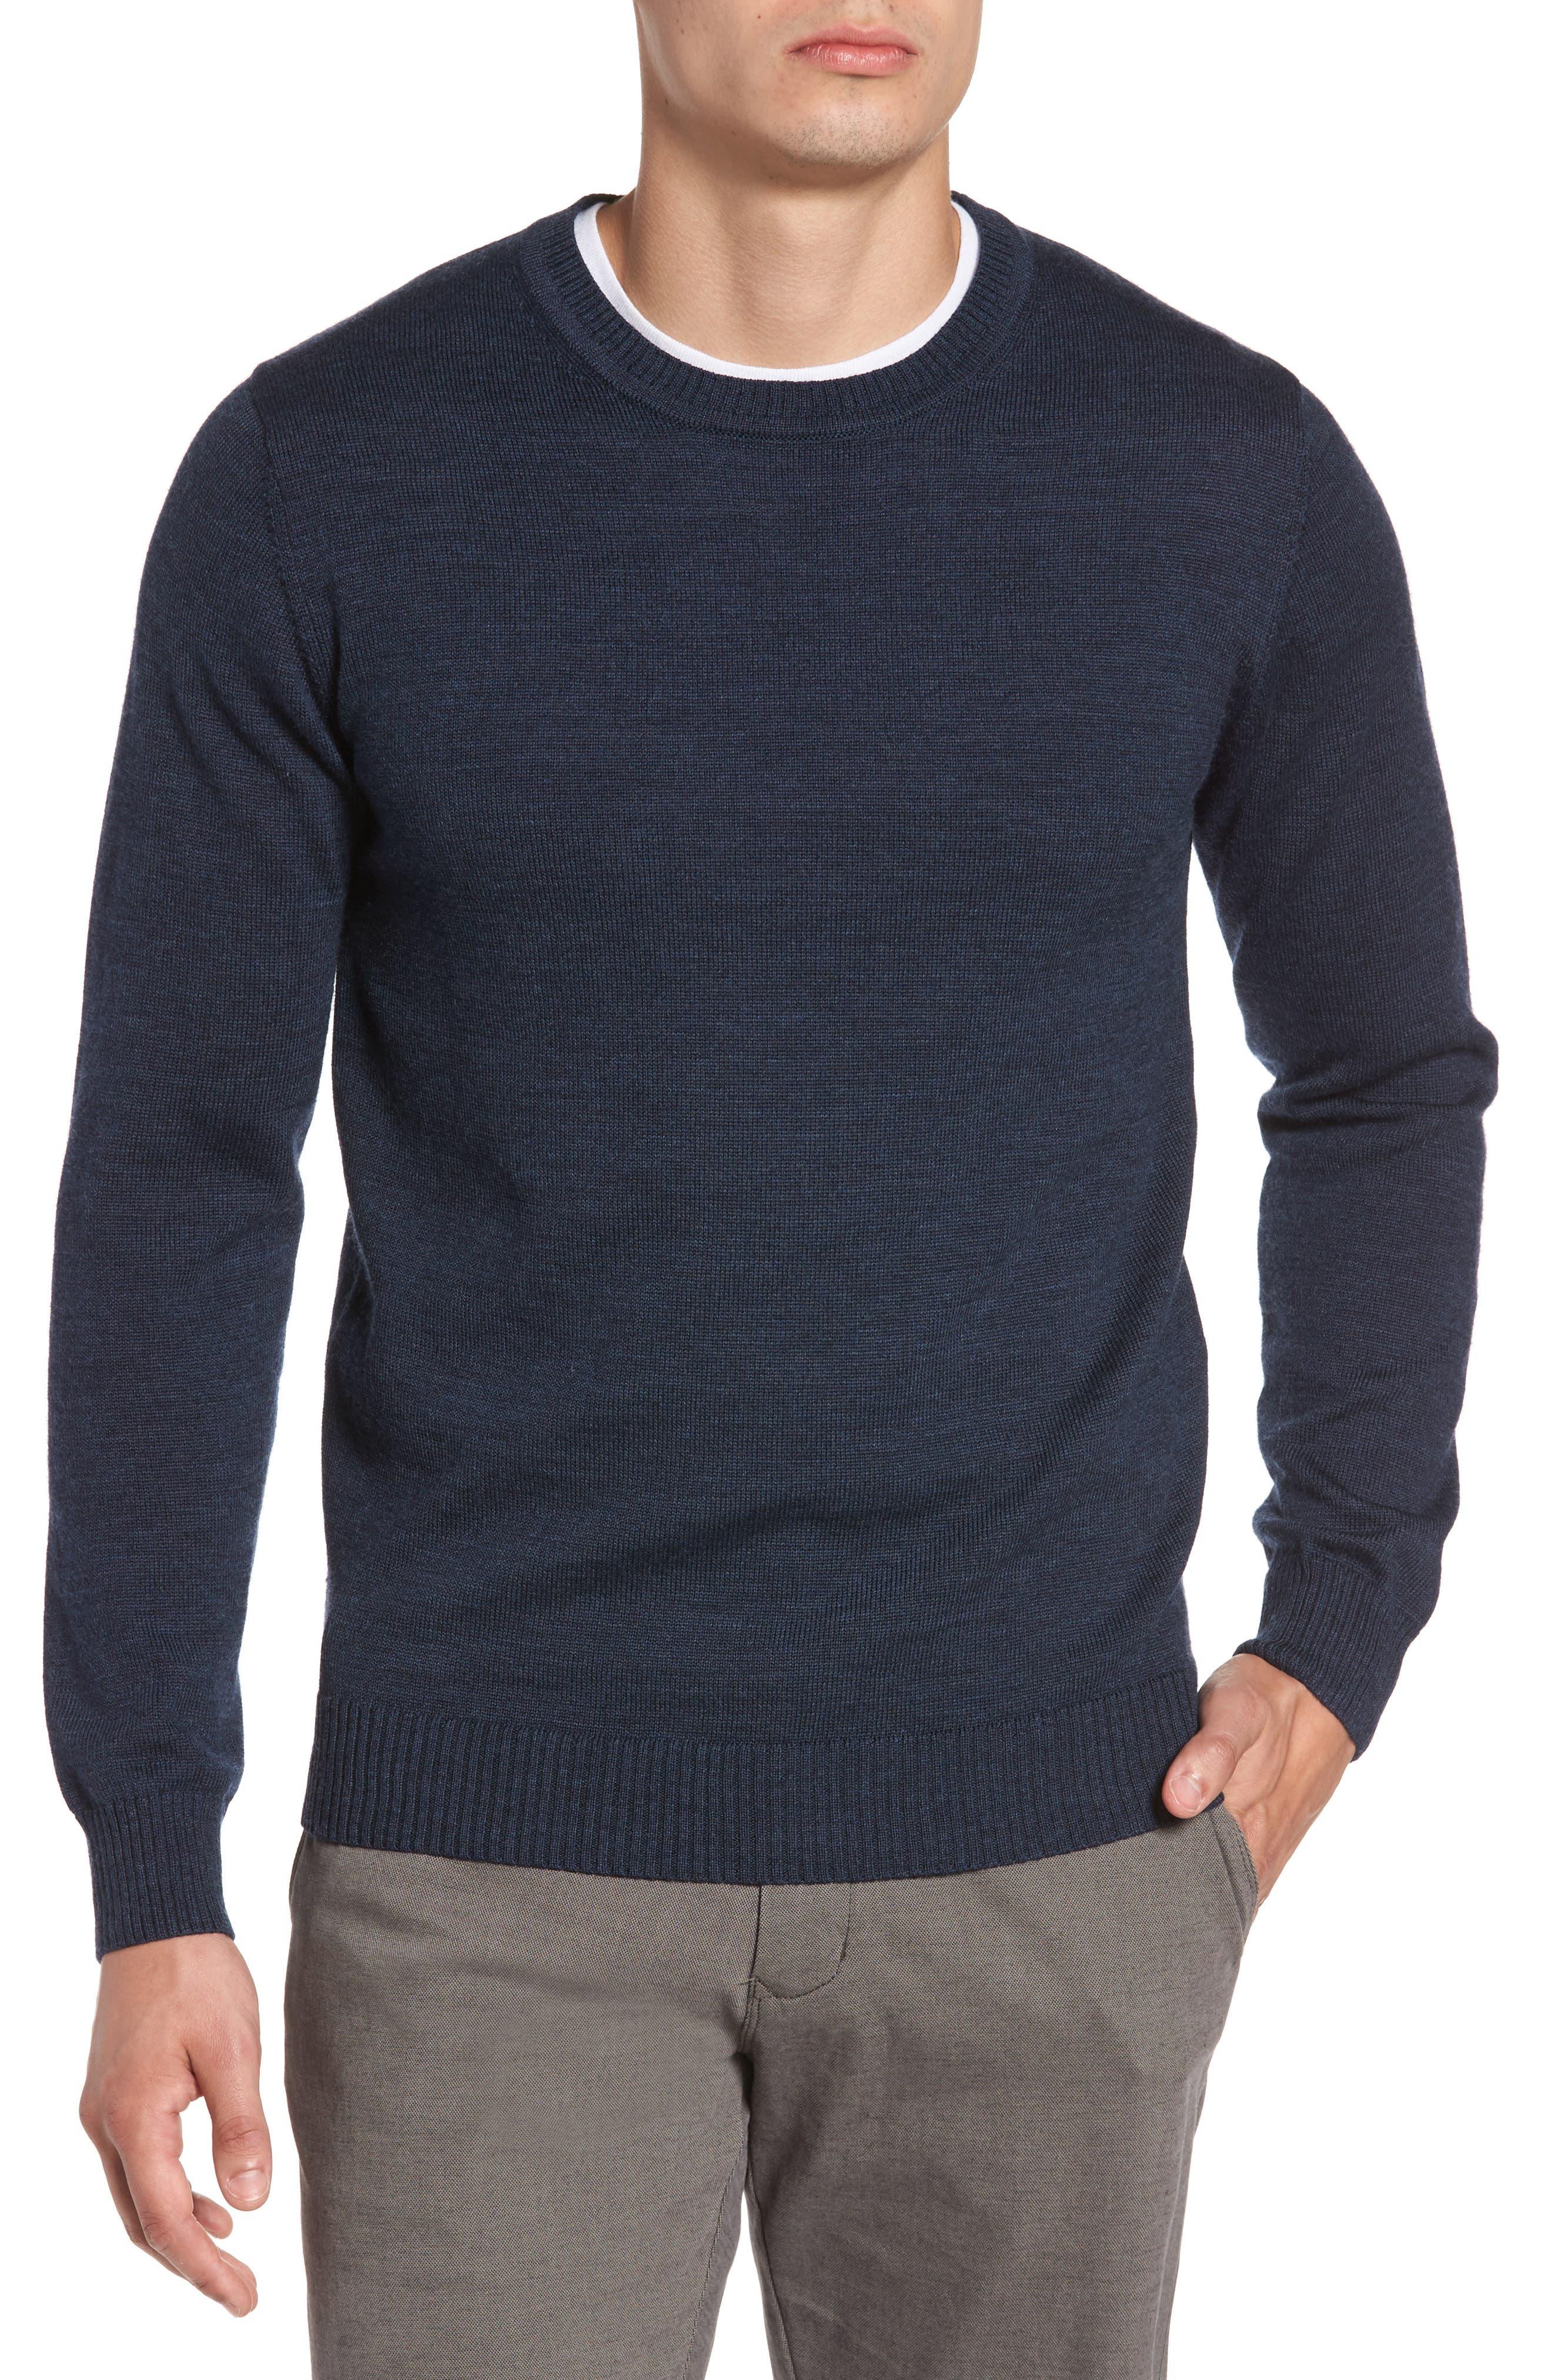 Main Image - Rodd & Gunn Bannockburn Mélange Merino Wool Sweater